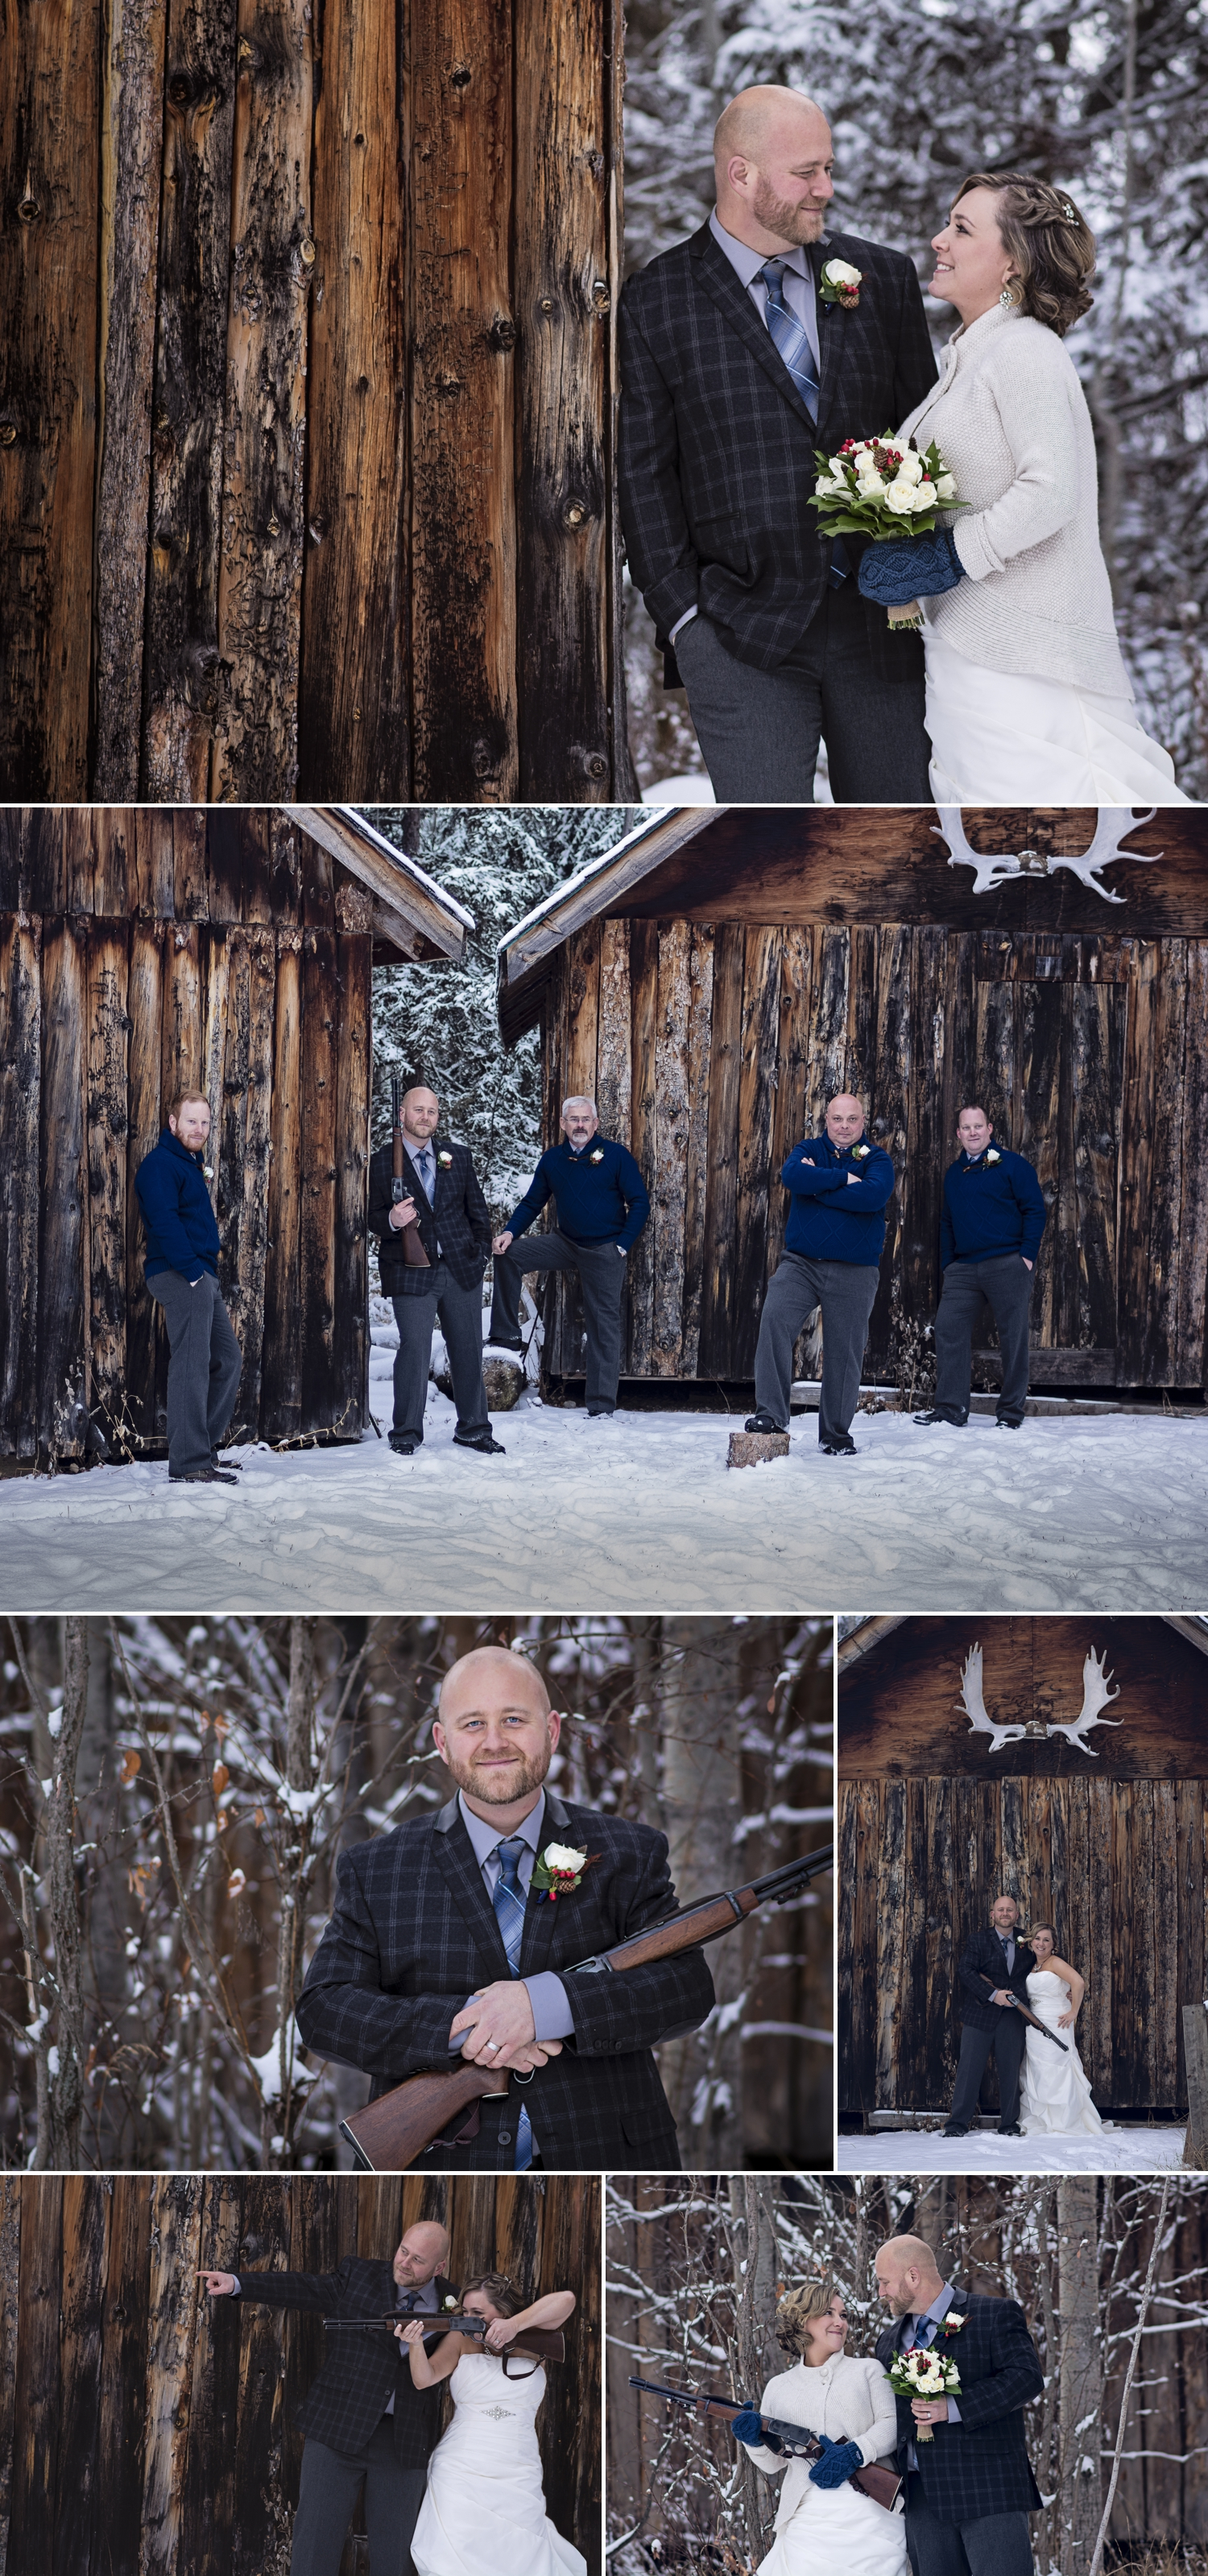 Wedding at Camp VanEs, Cooking Lake, Alberta, Canada. Photography by Friday Design + Photography from Edmonton, Alberta, Canada